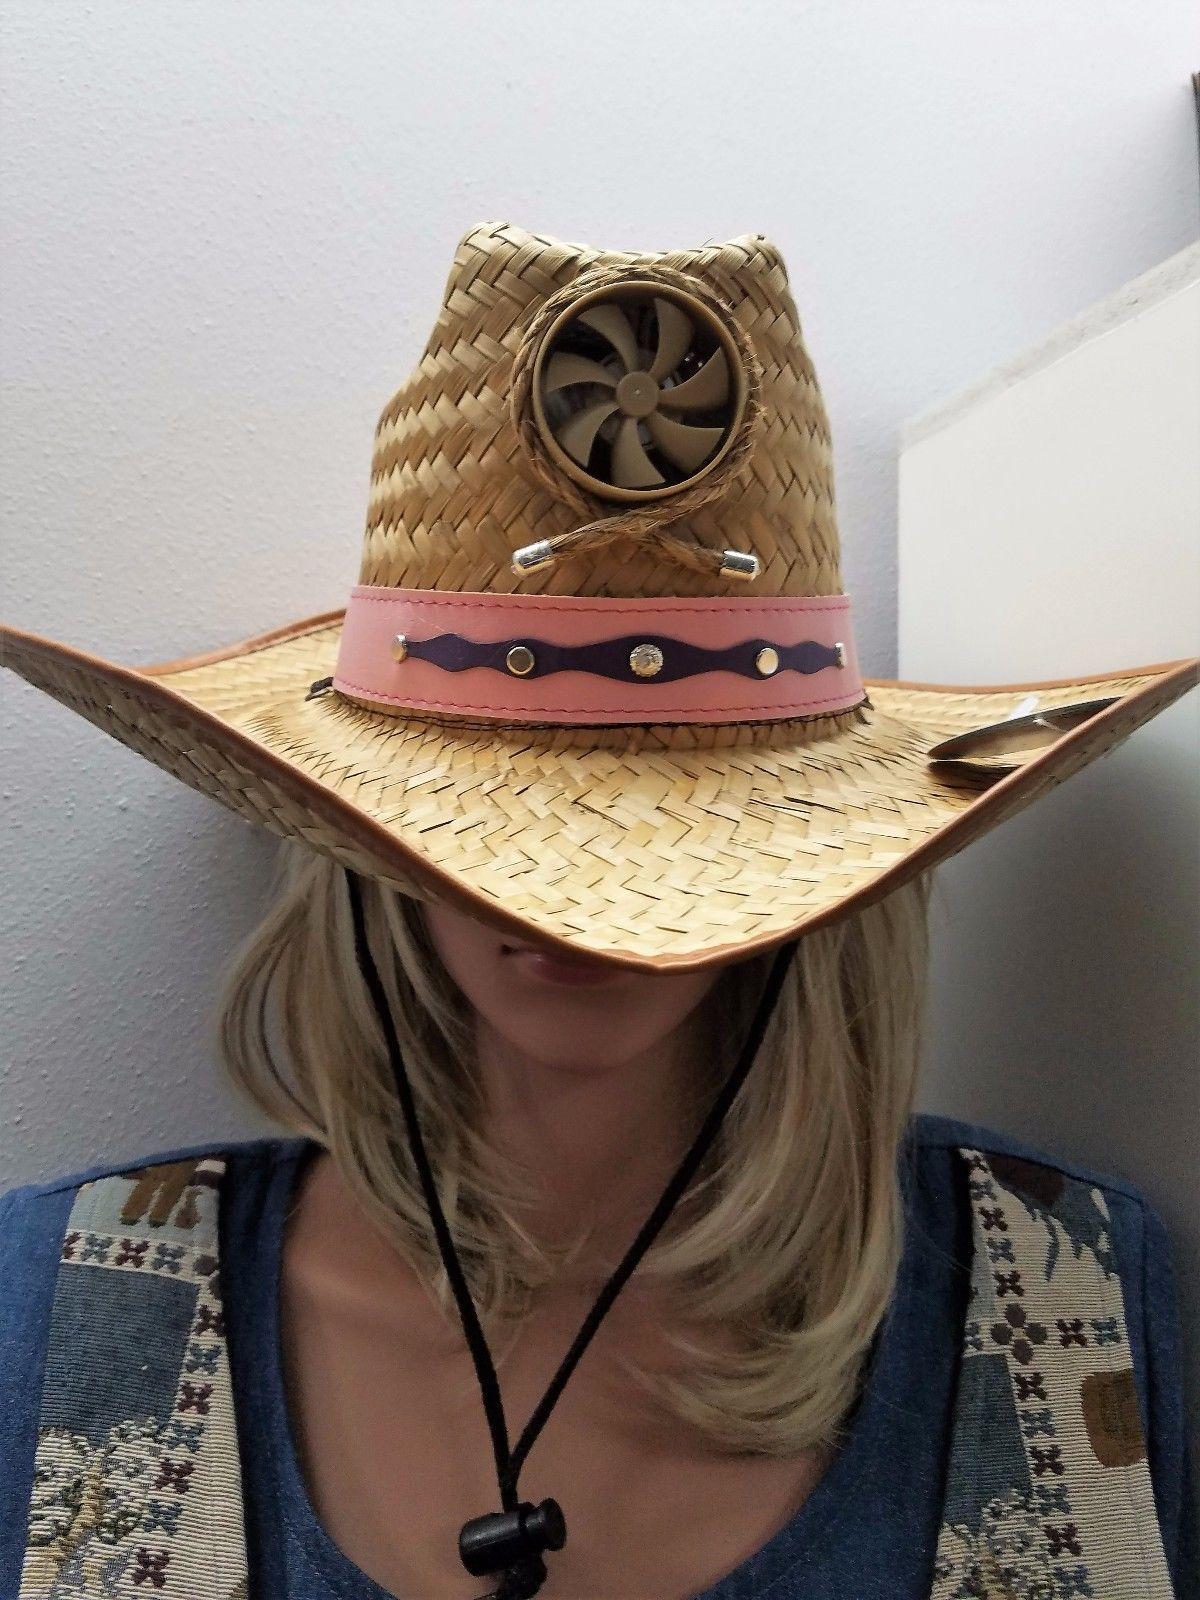 ddb9e2446 Women's Kool Breeze Solar Cowboy Hat, Straw Hat, Solar Cooling Hat ...